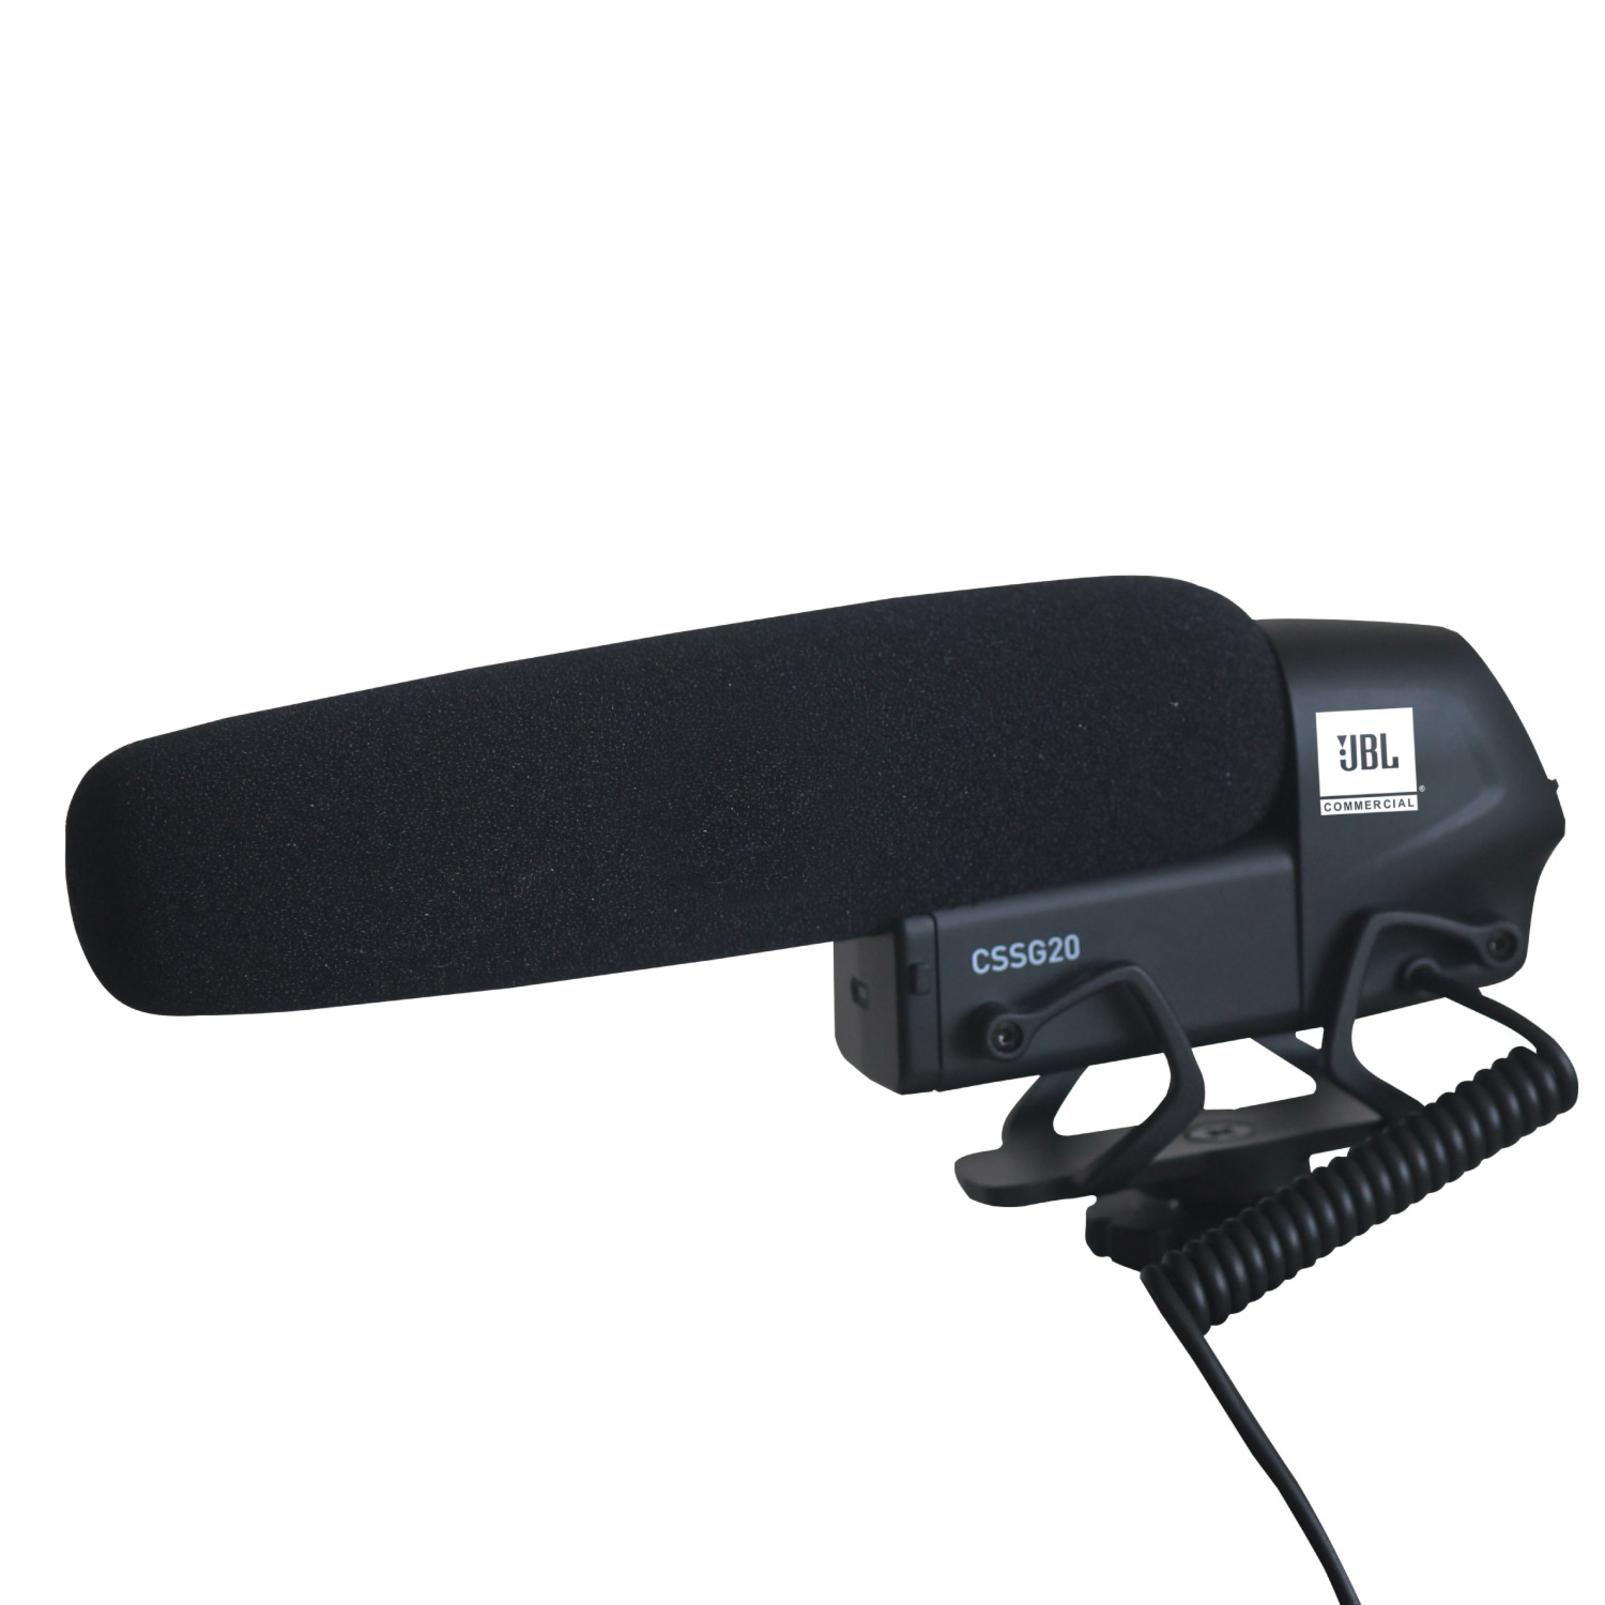 CSSG20 - Black - On-Camera Shotgun Microphone - Detailshot 3